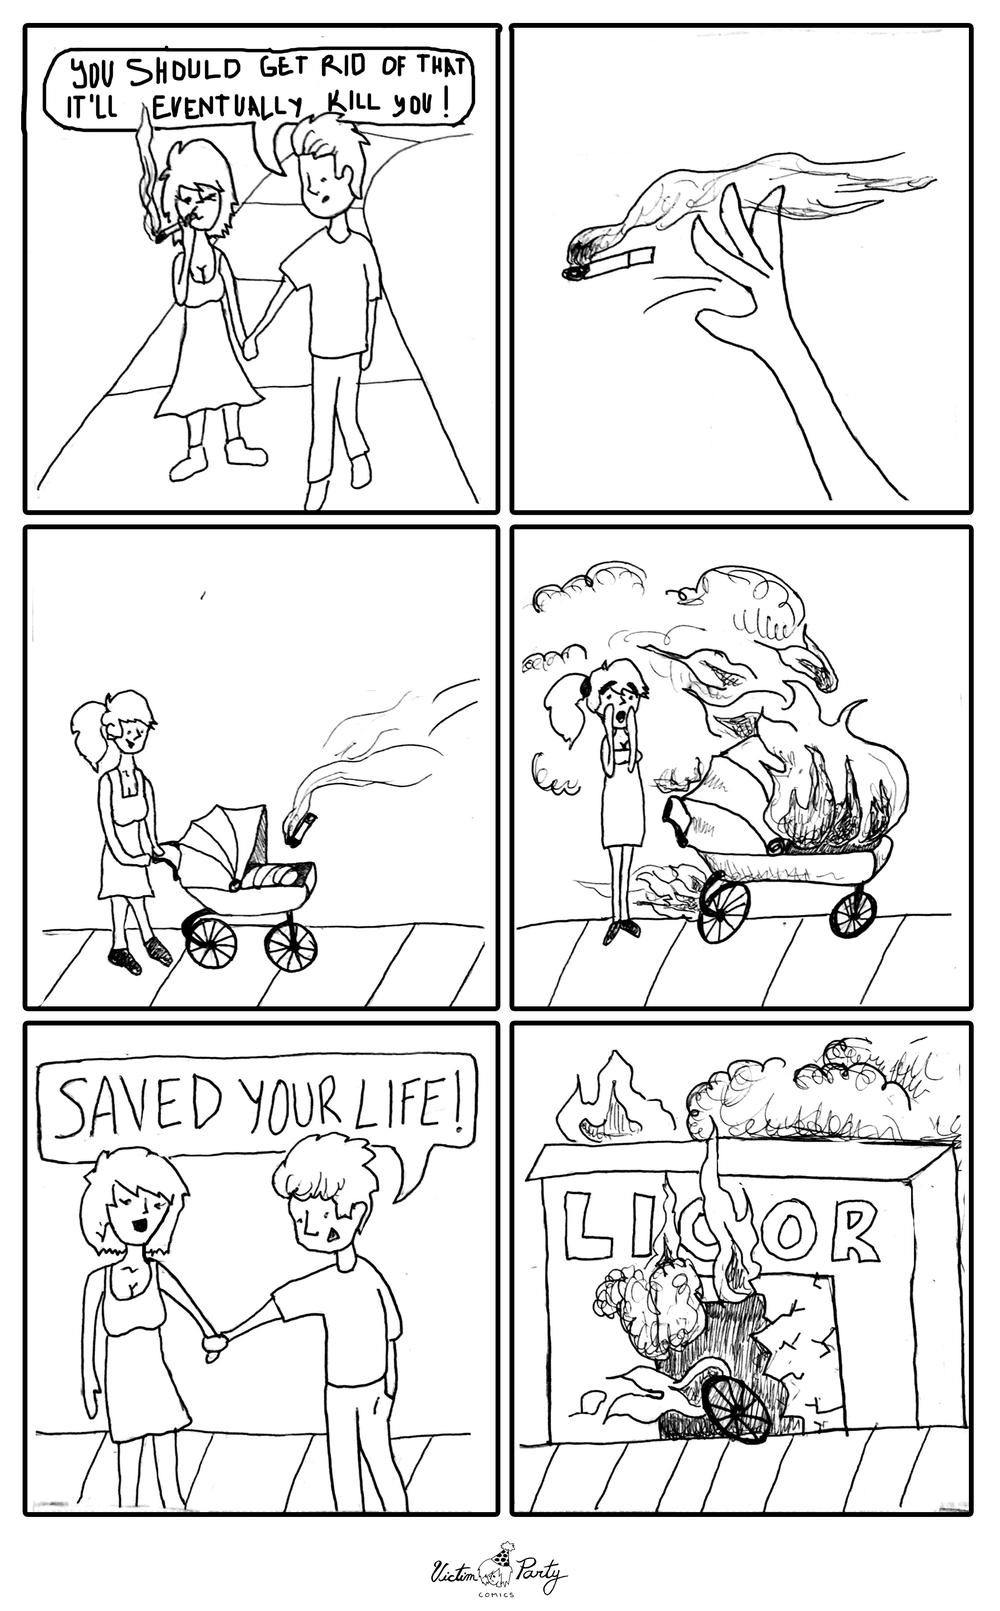 Smoking Kills by Olivia Grace - Victim Party Comics